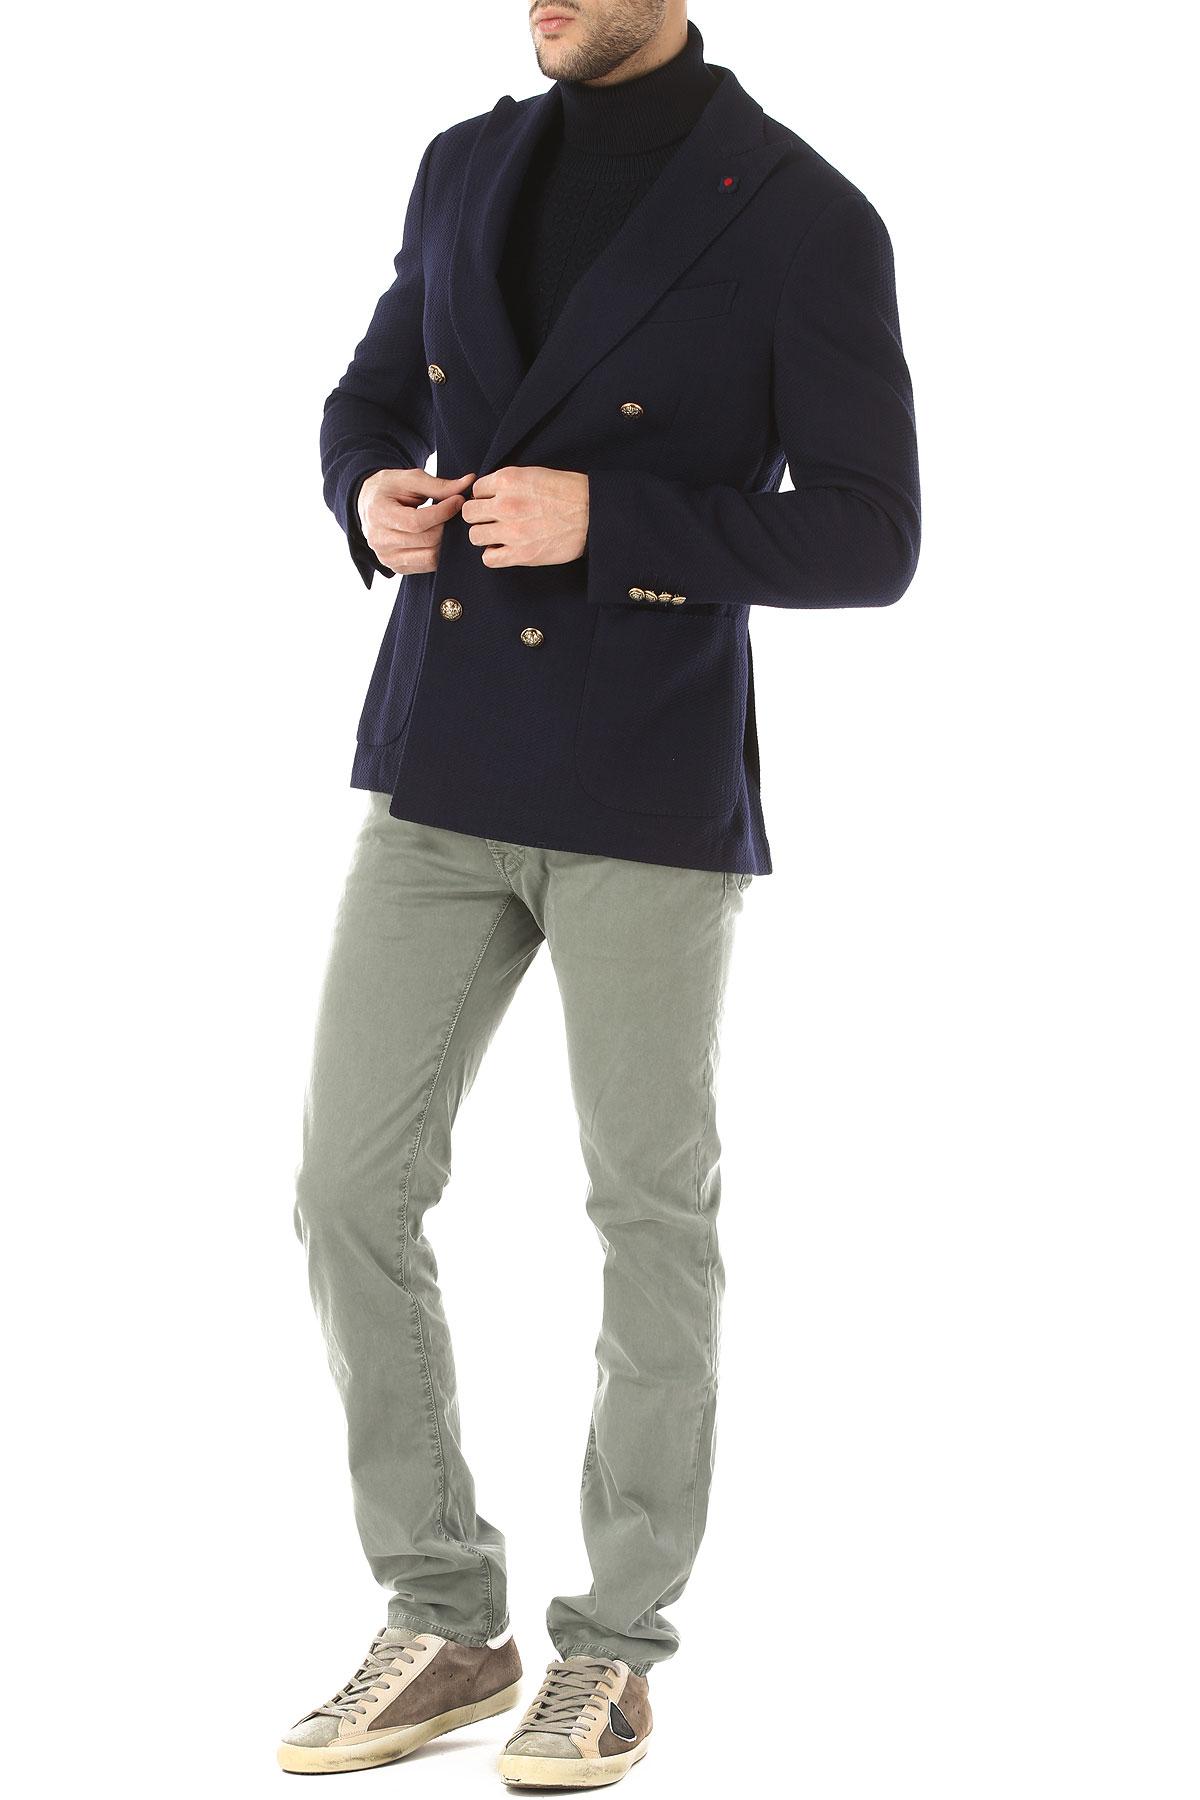 bf1b9c4da8053 صور ملابس رجال